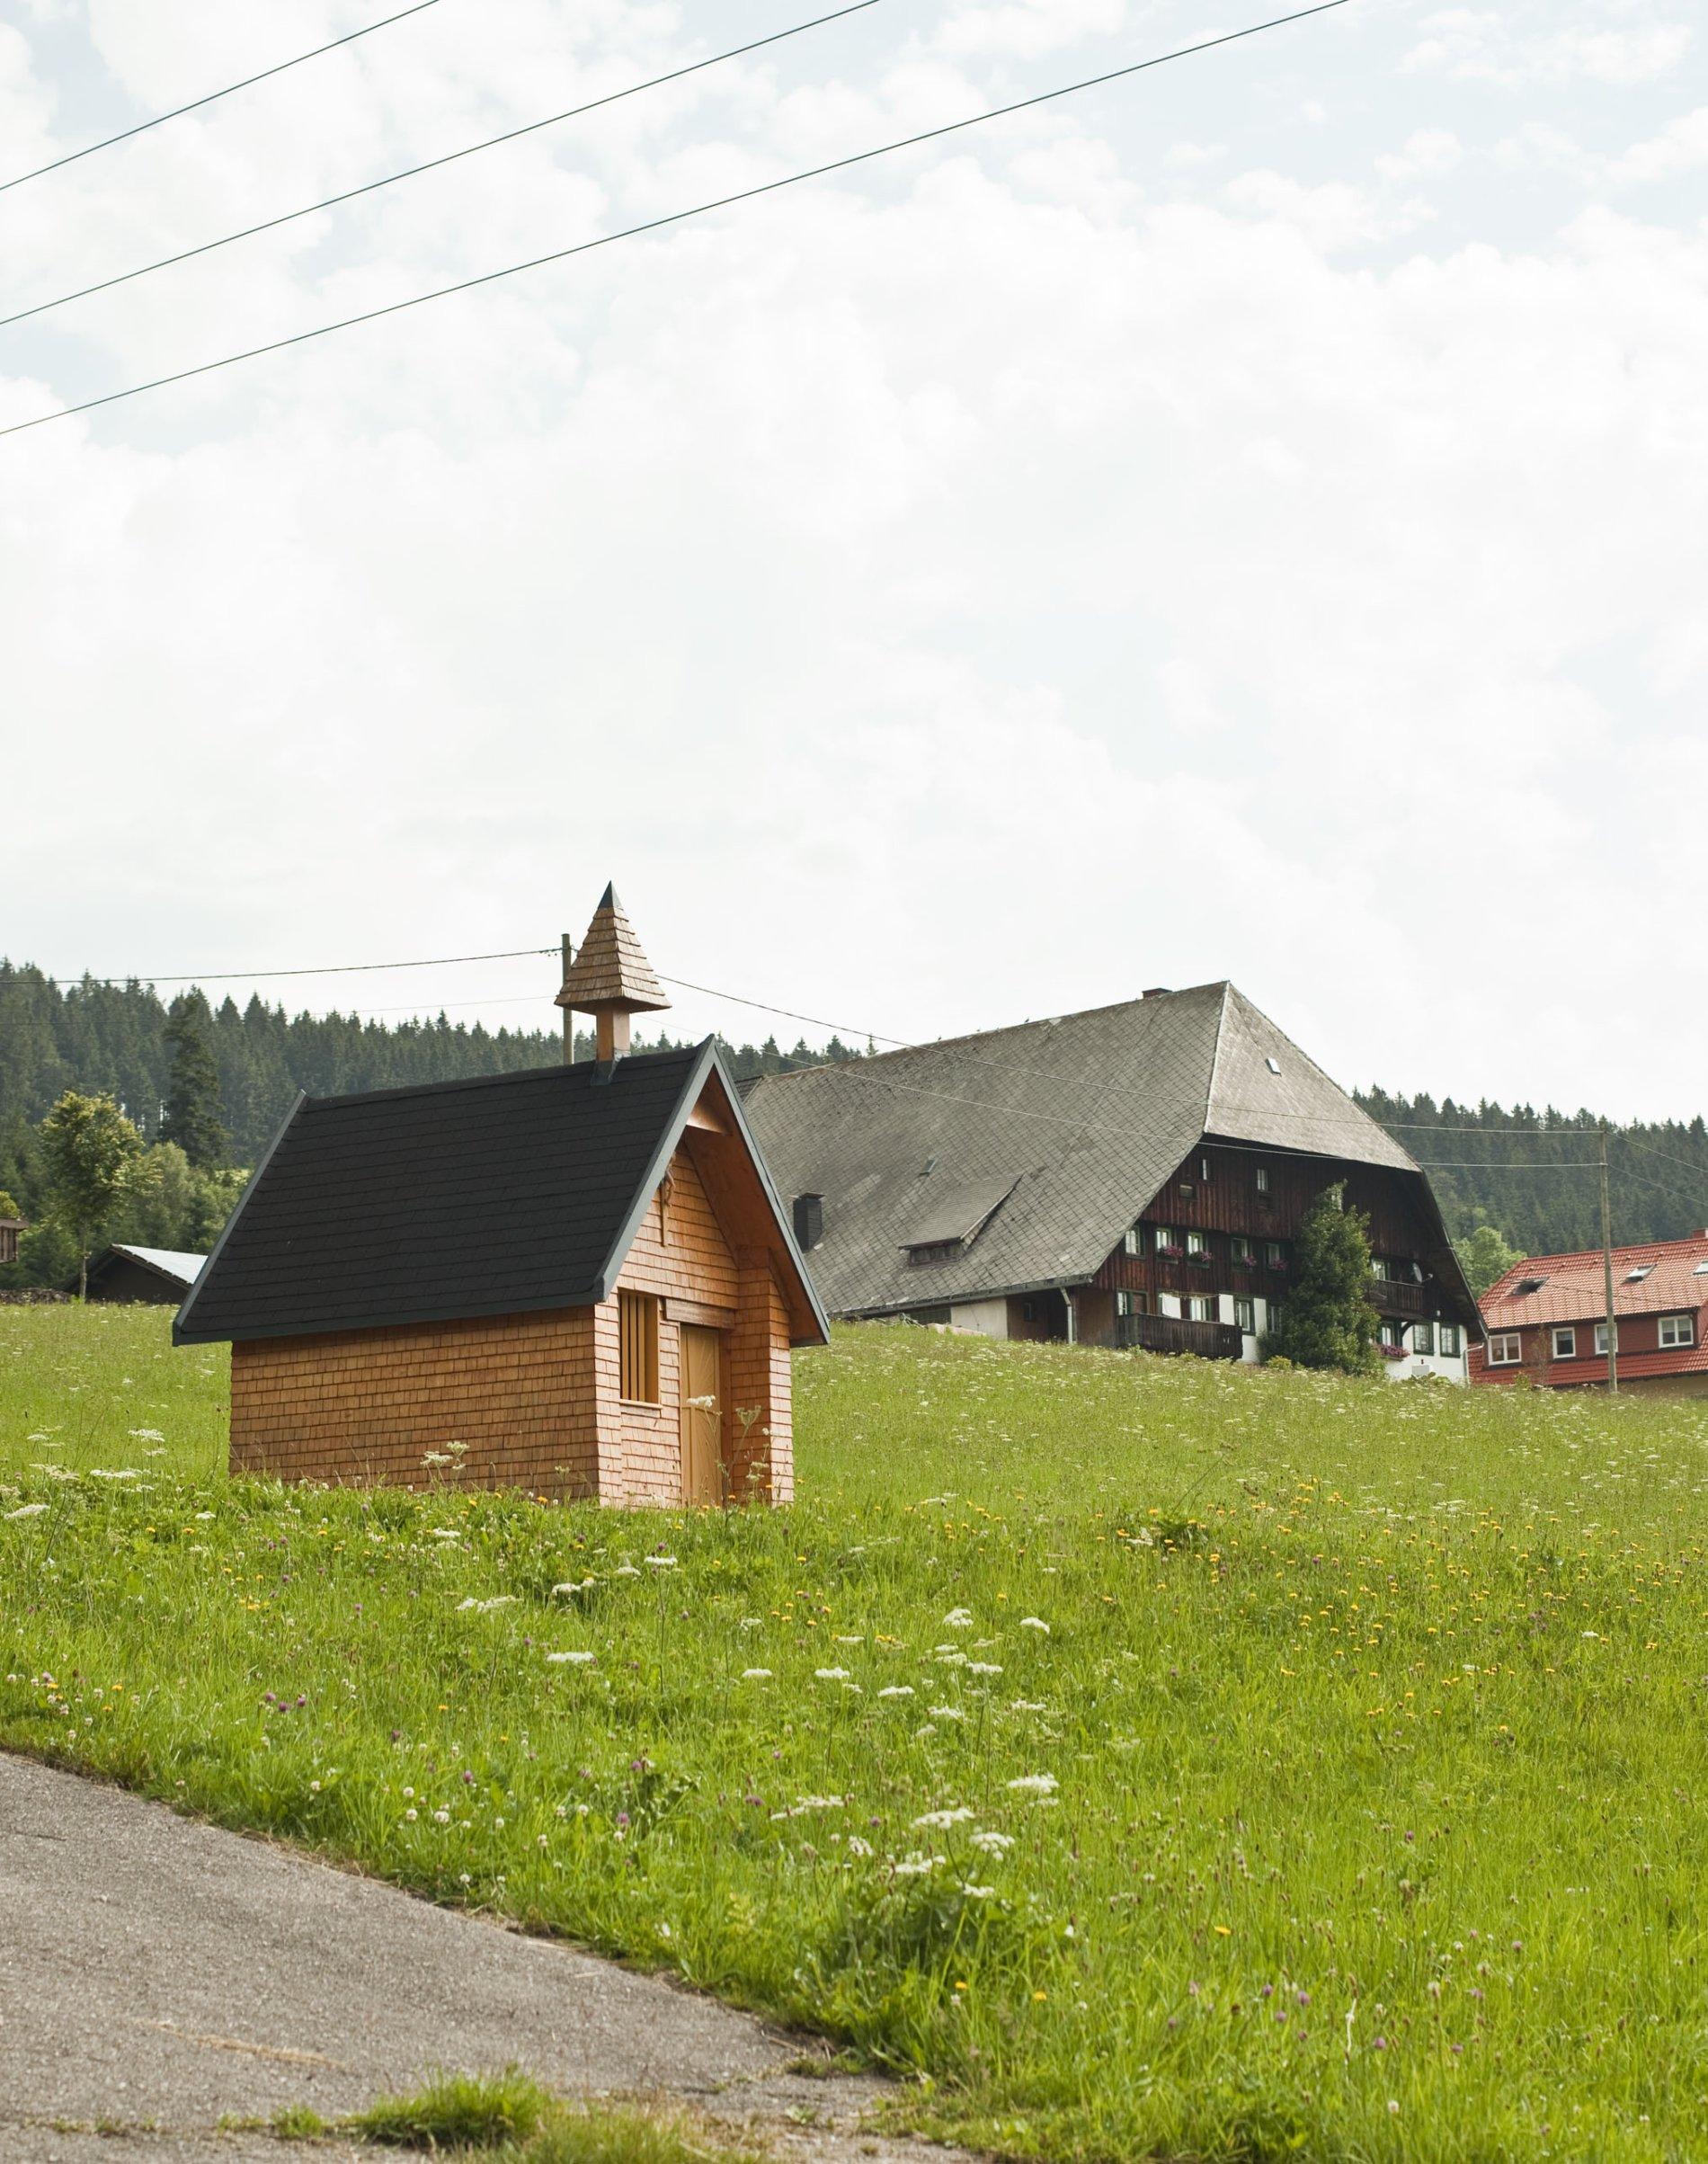 Hanisenhofkapelle